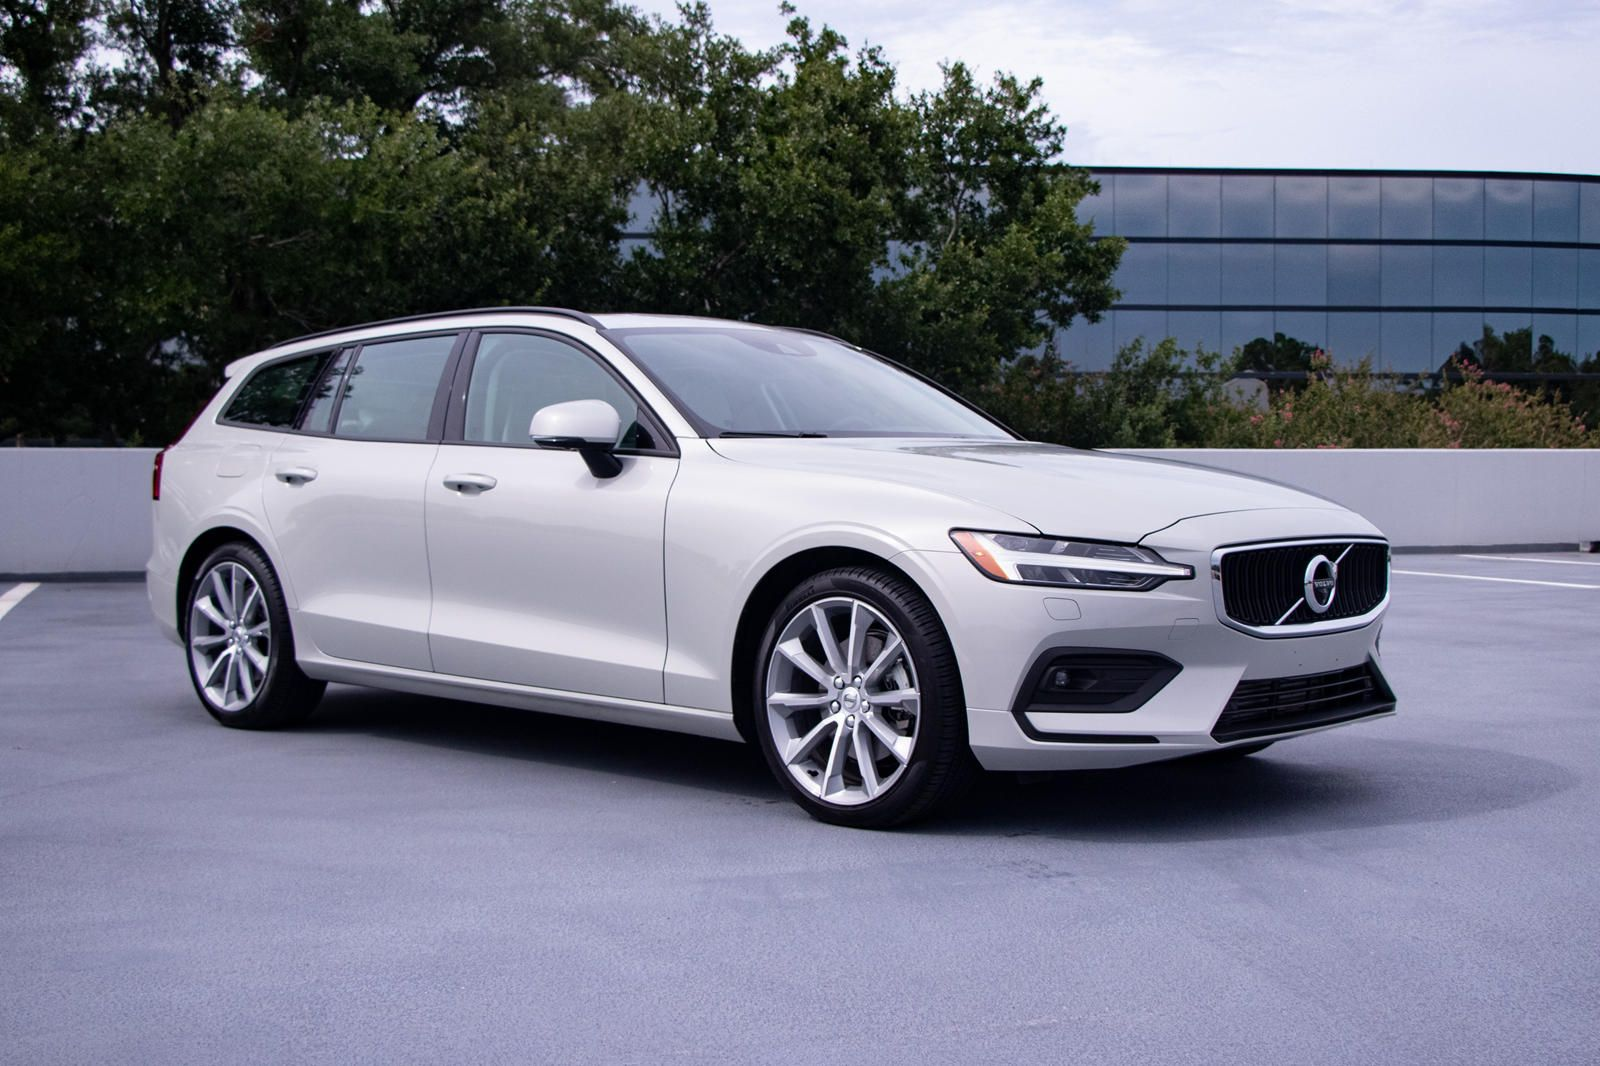 2020 Volvo V60 Test Drive Review Long Live The Wagon In 2020 Volvo Volvo V60 Exterior Design